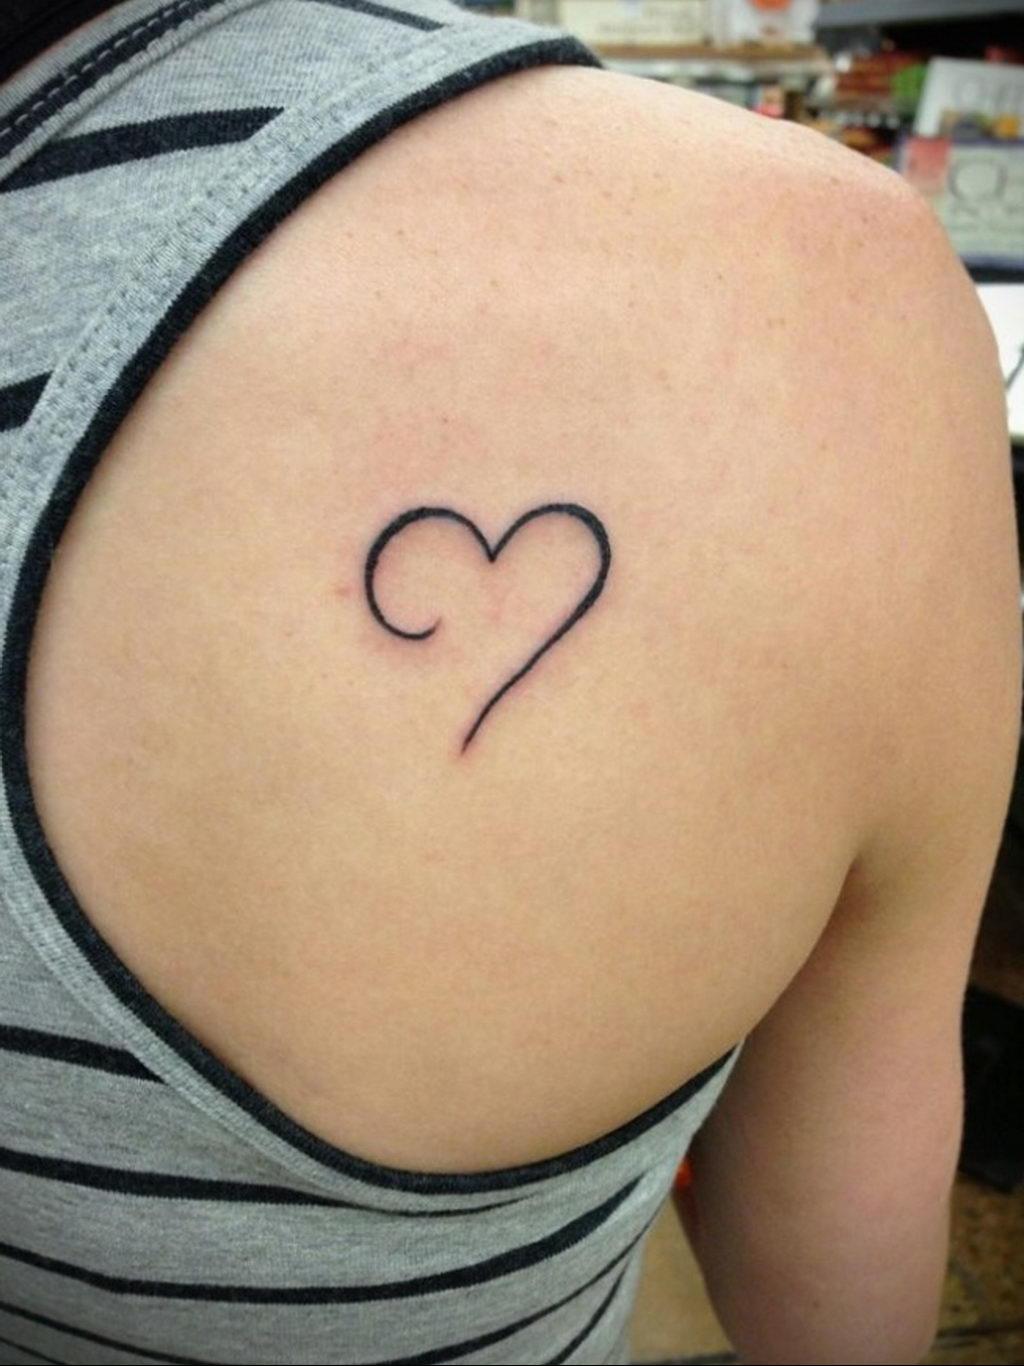 Фото тату про любовь рисунок Сердце 03.02.2020 №029 -heart tattoo- tatufoto.com